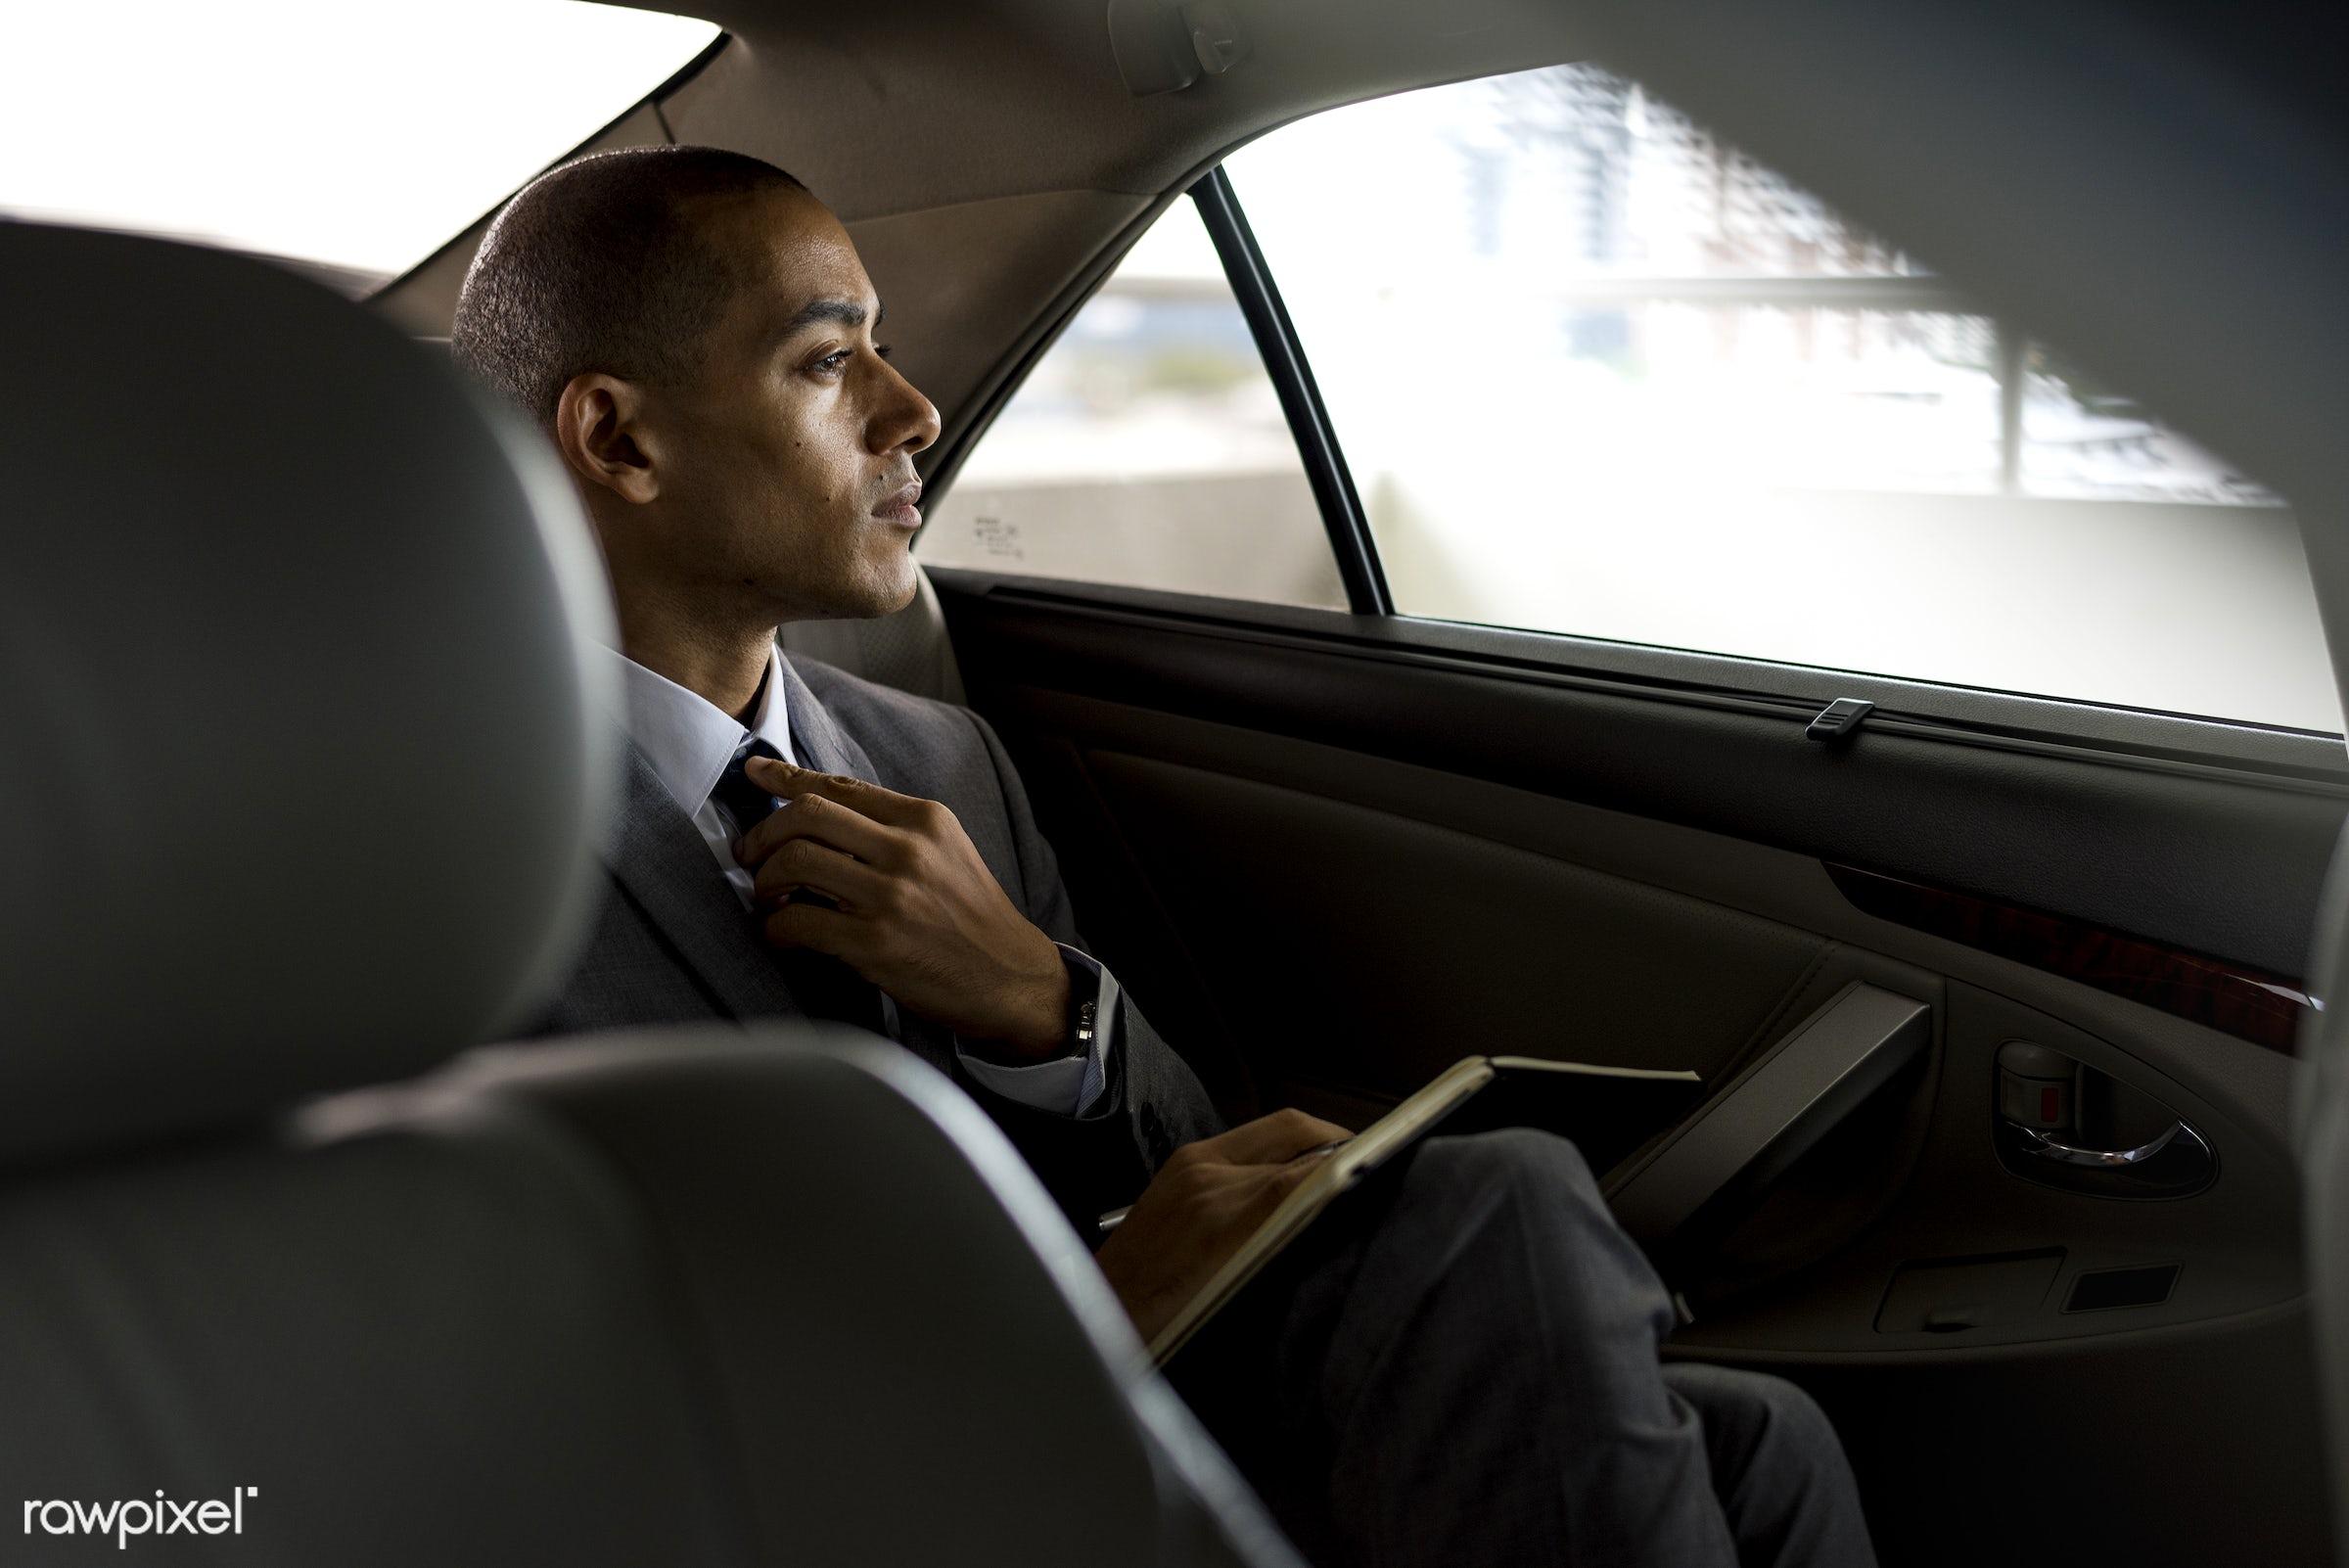 adult, back seat, business, businessman, businessmen, candid, car, corporate, device, digital device, employee, ethnicity,...